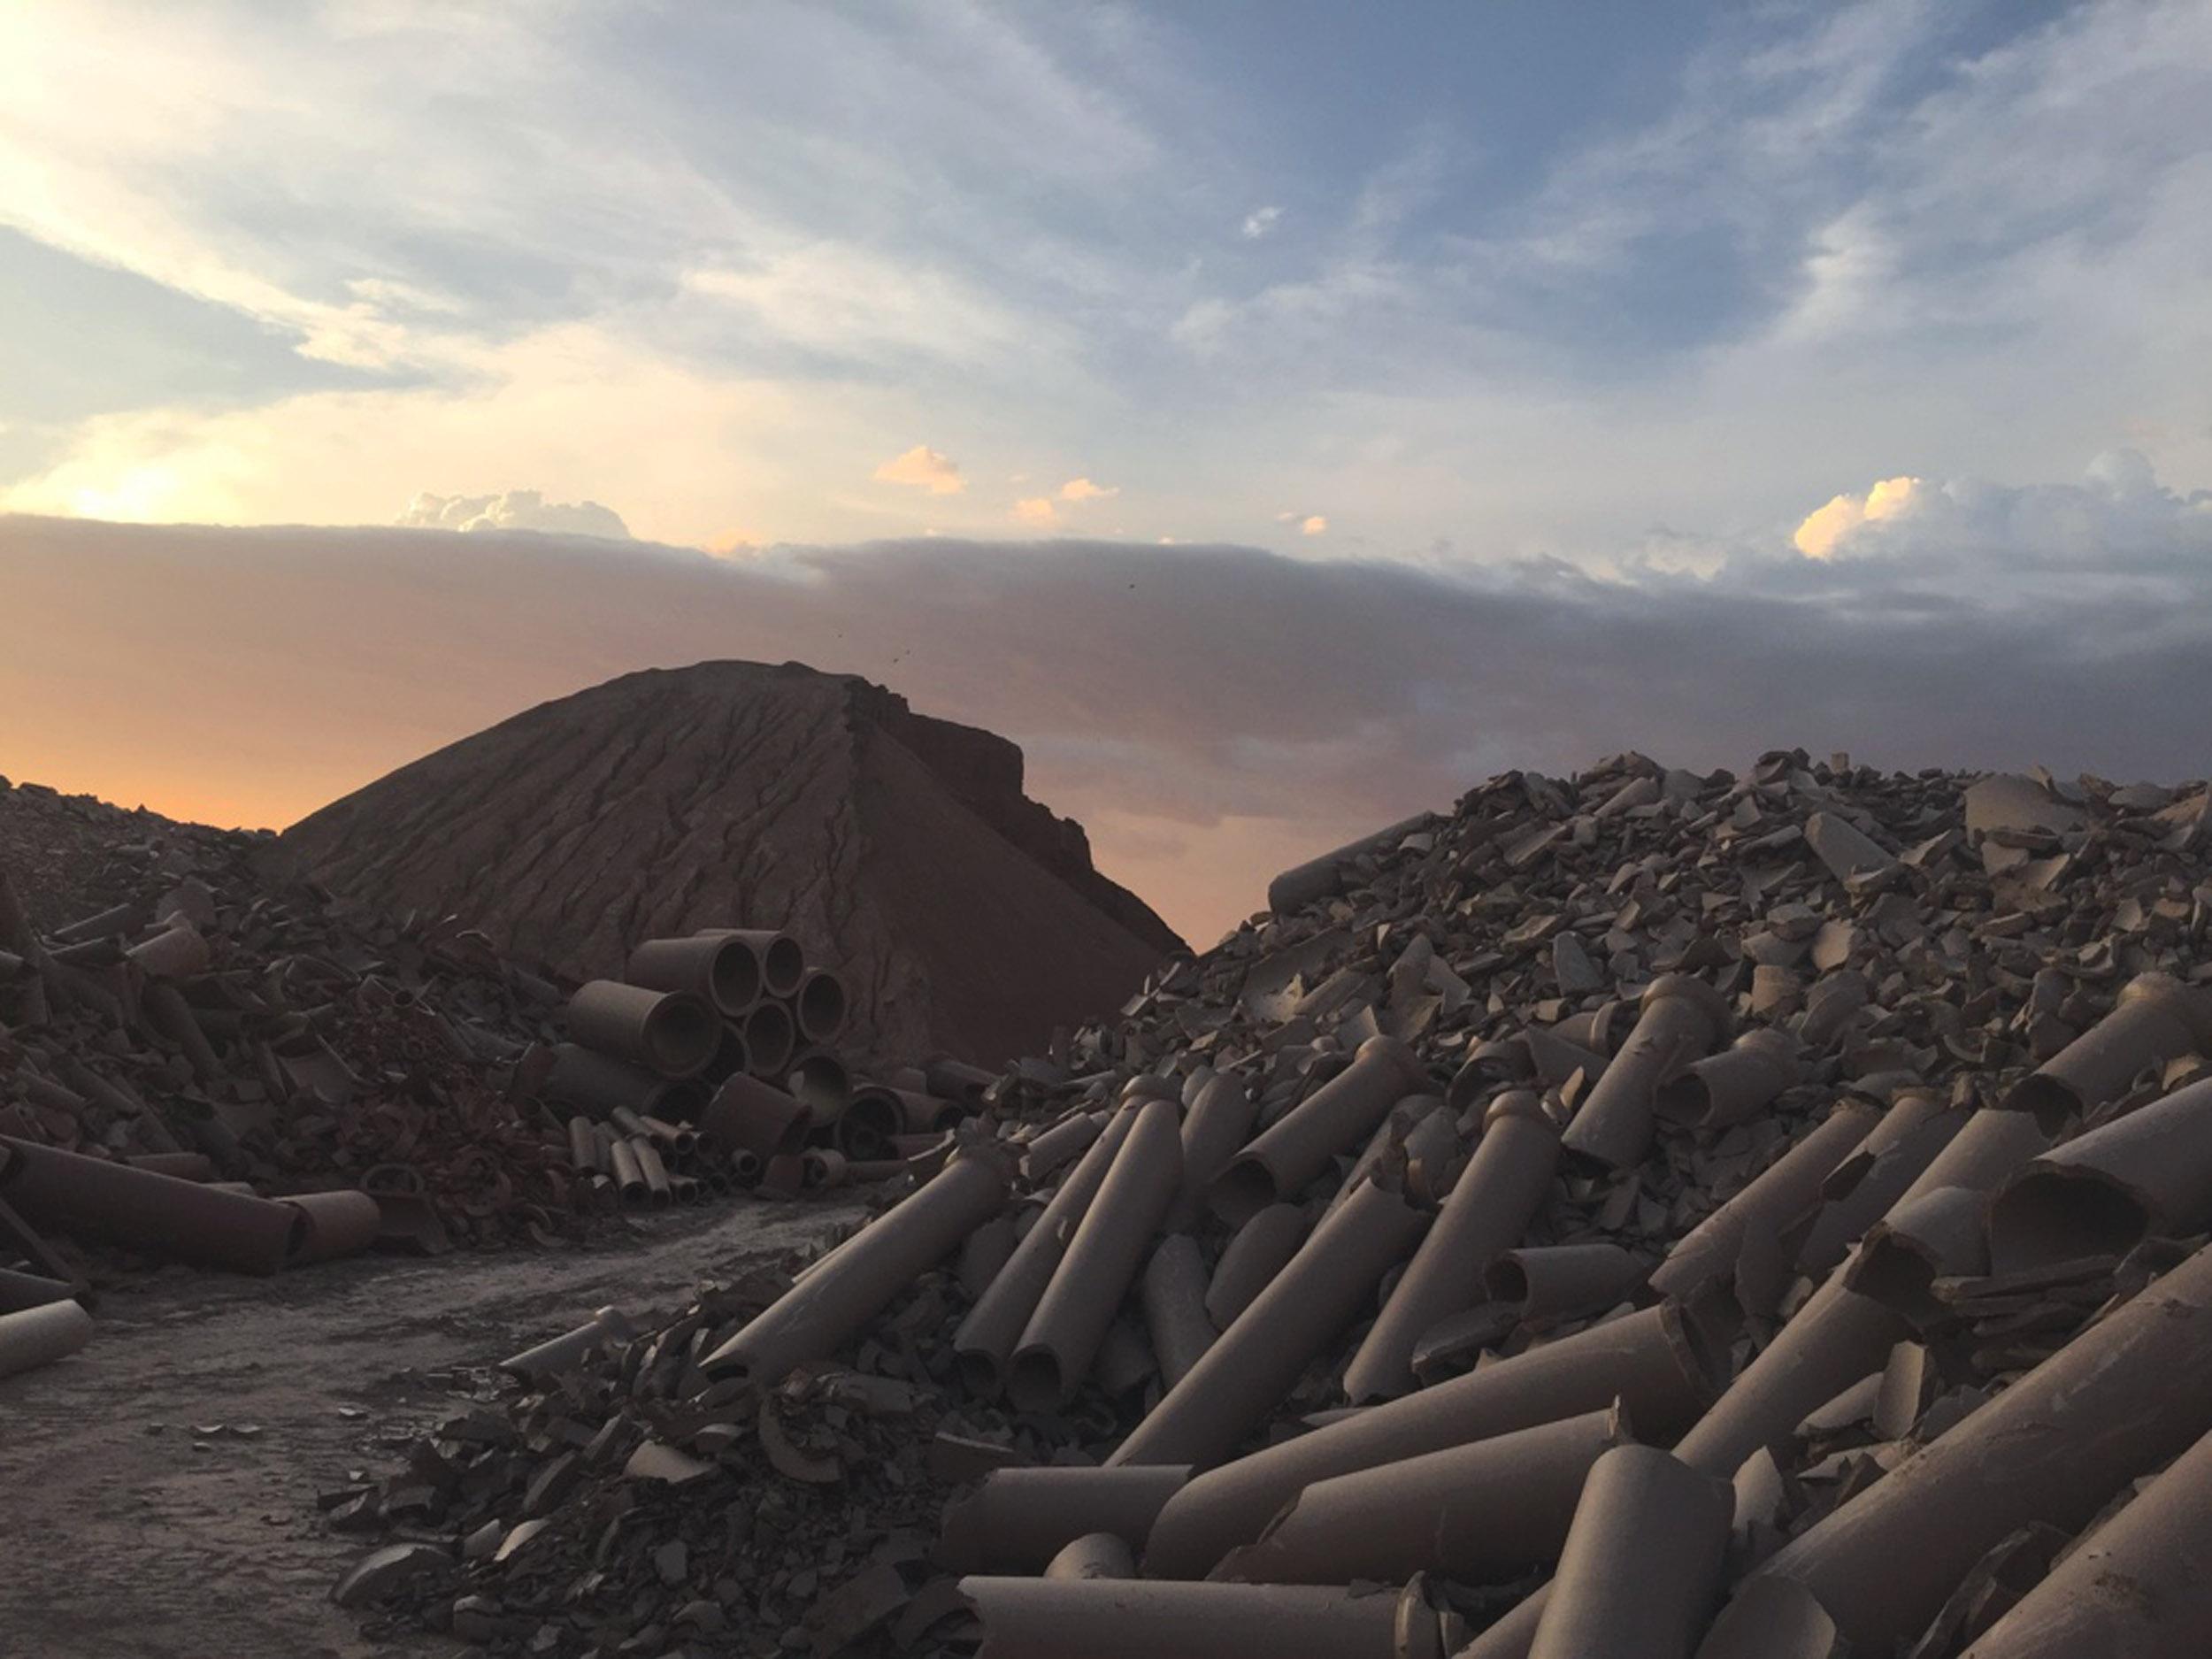 MIssion Clay Phoenix Arizona.Photograph by Tom Franco 2016